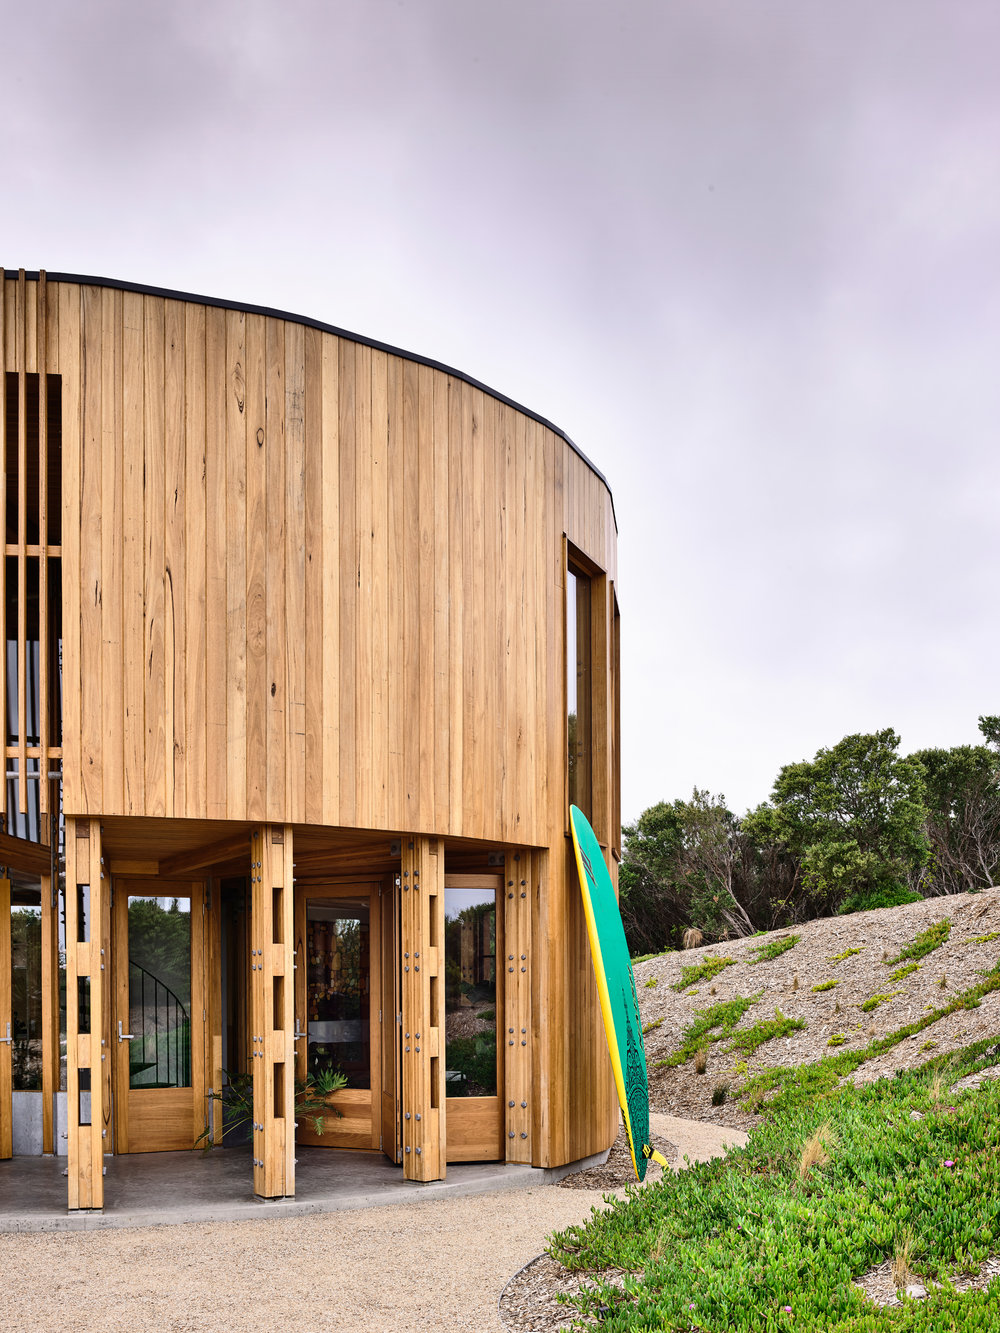 8_St Andrews Beach House_Austin Maynard Architects_Inspirationist